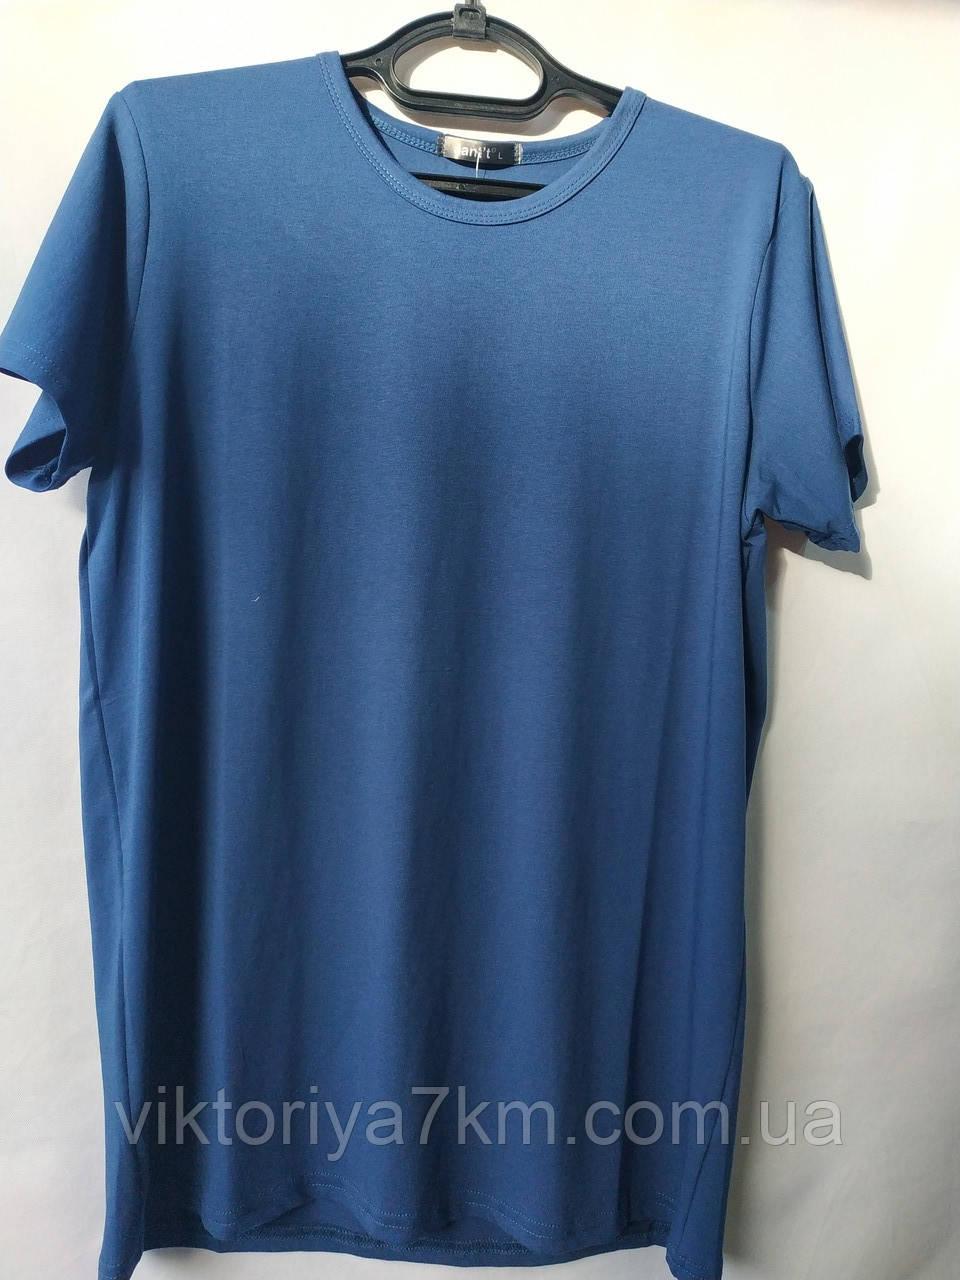 Мужская футболка оптом Турция (М-2XL) RS2-5007